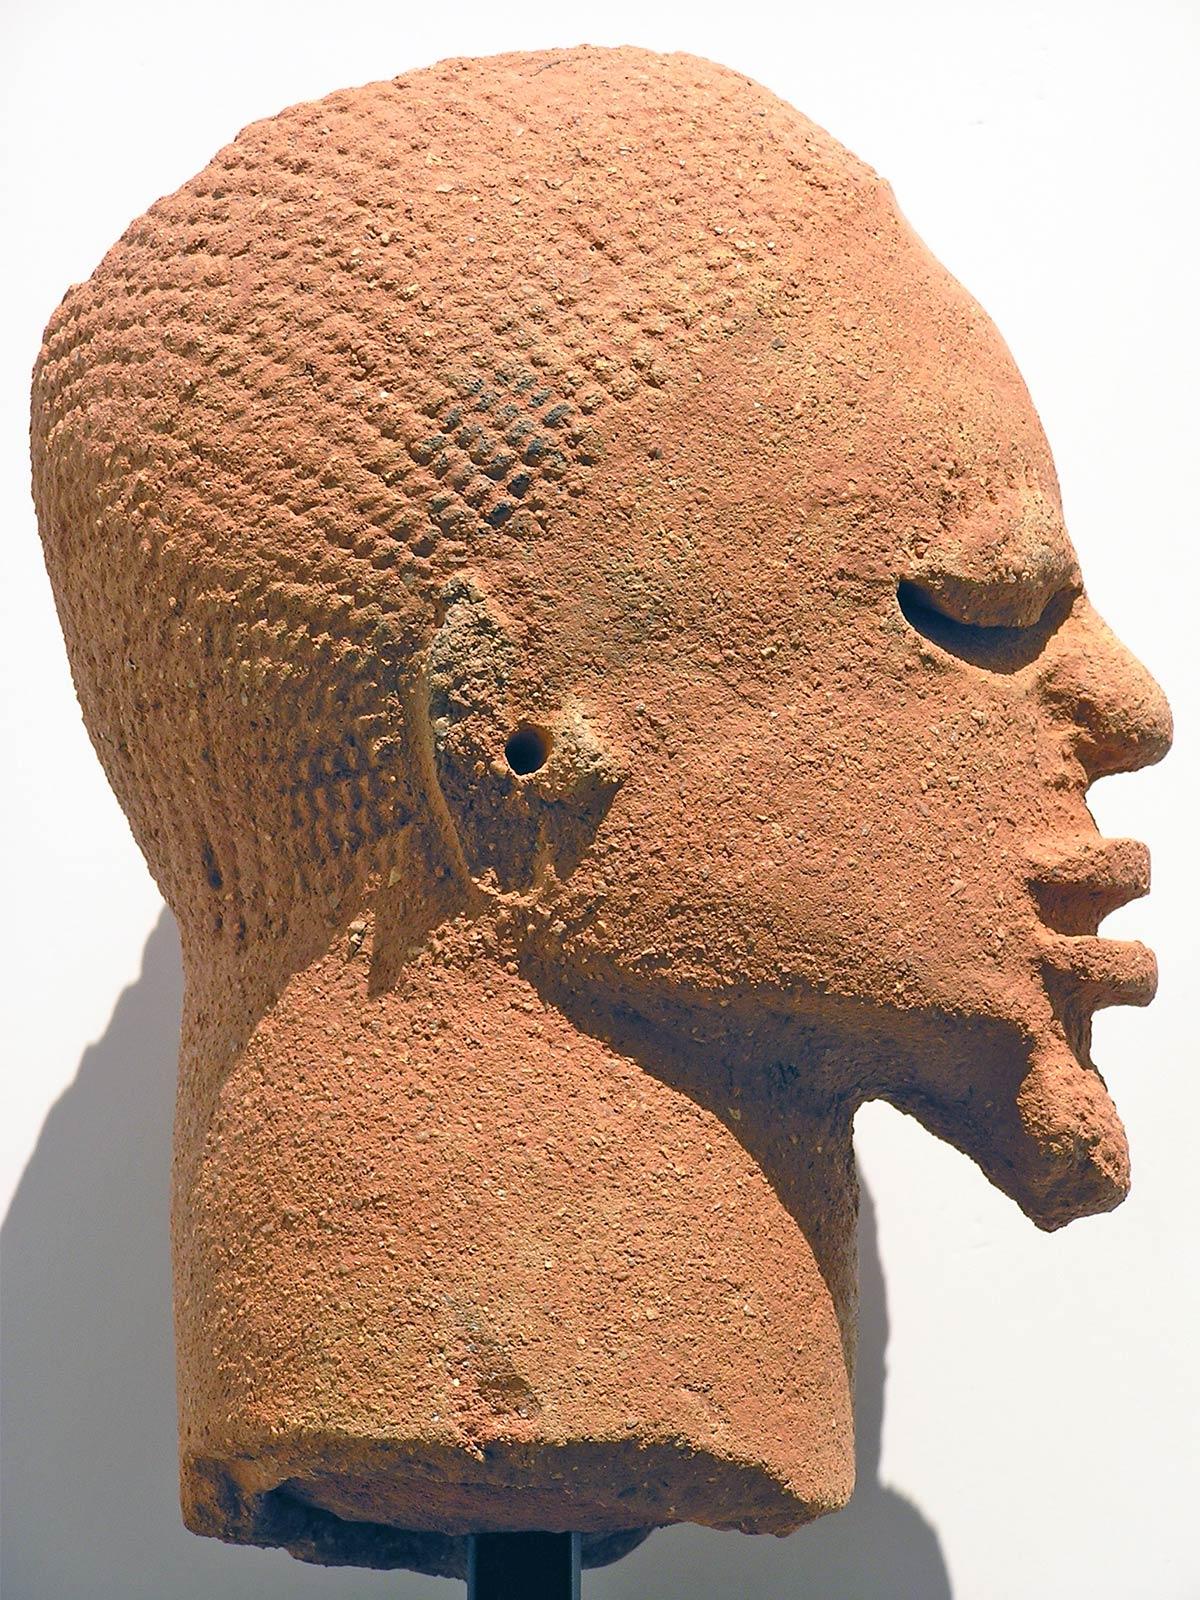 escultura cabeza terracota Nok Niger exposición arte africano colaboración Palacio Santa Cruz Valladolid Fundación Alberto Jiménez-Arellano Alonso Henka Arquitectos